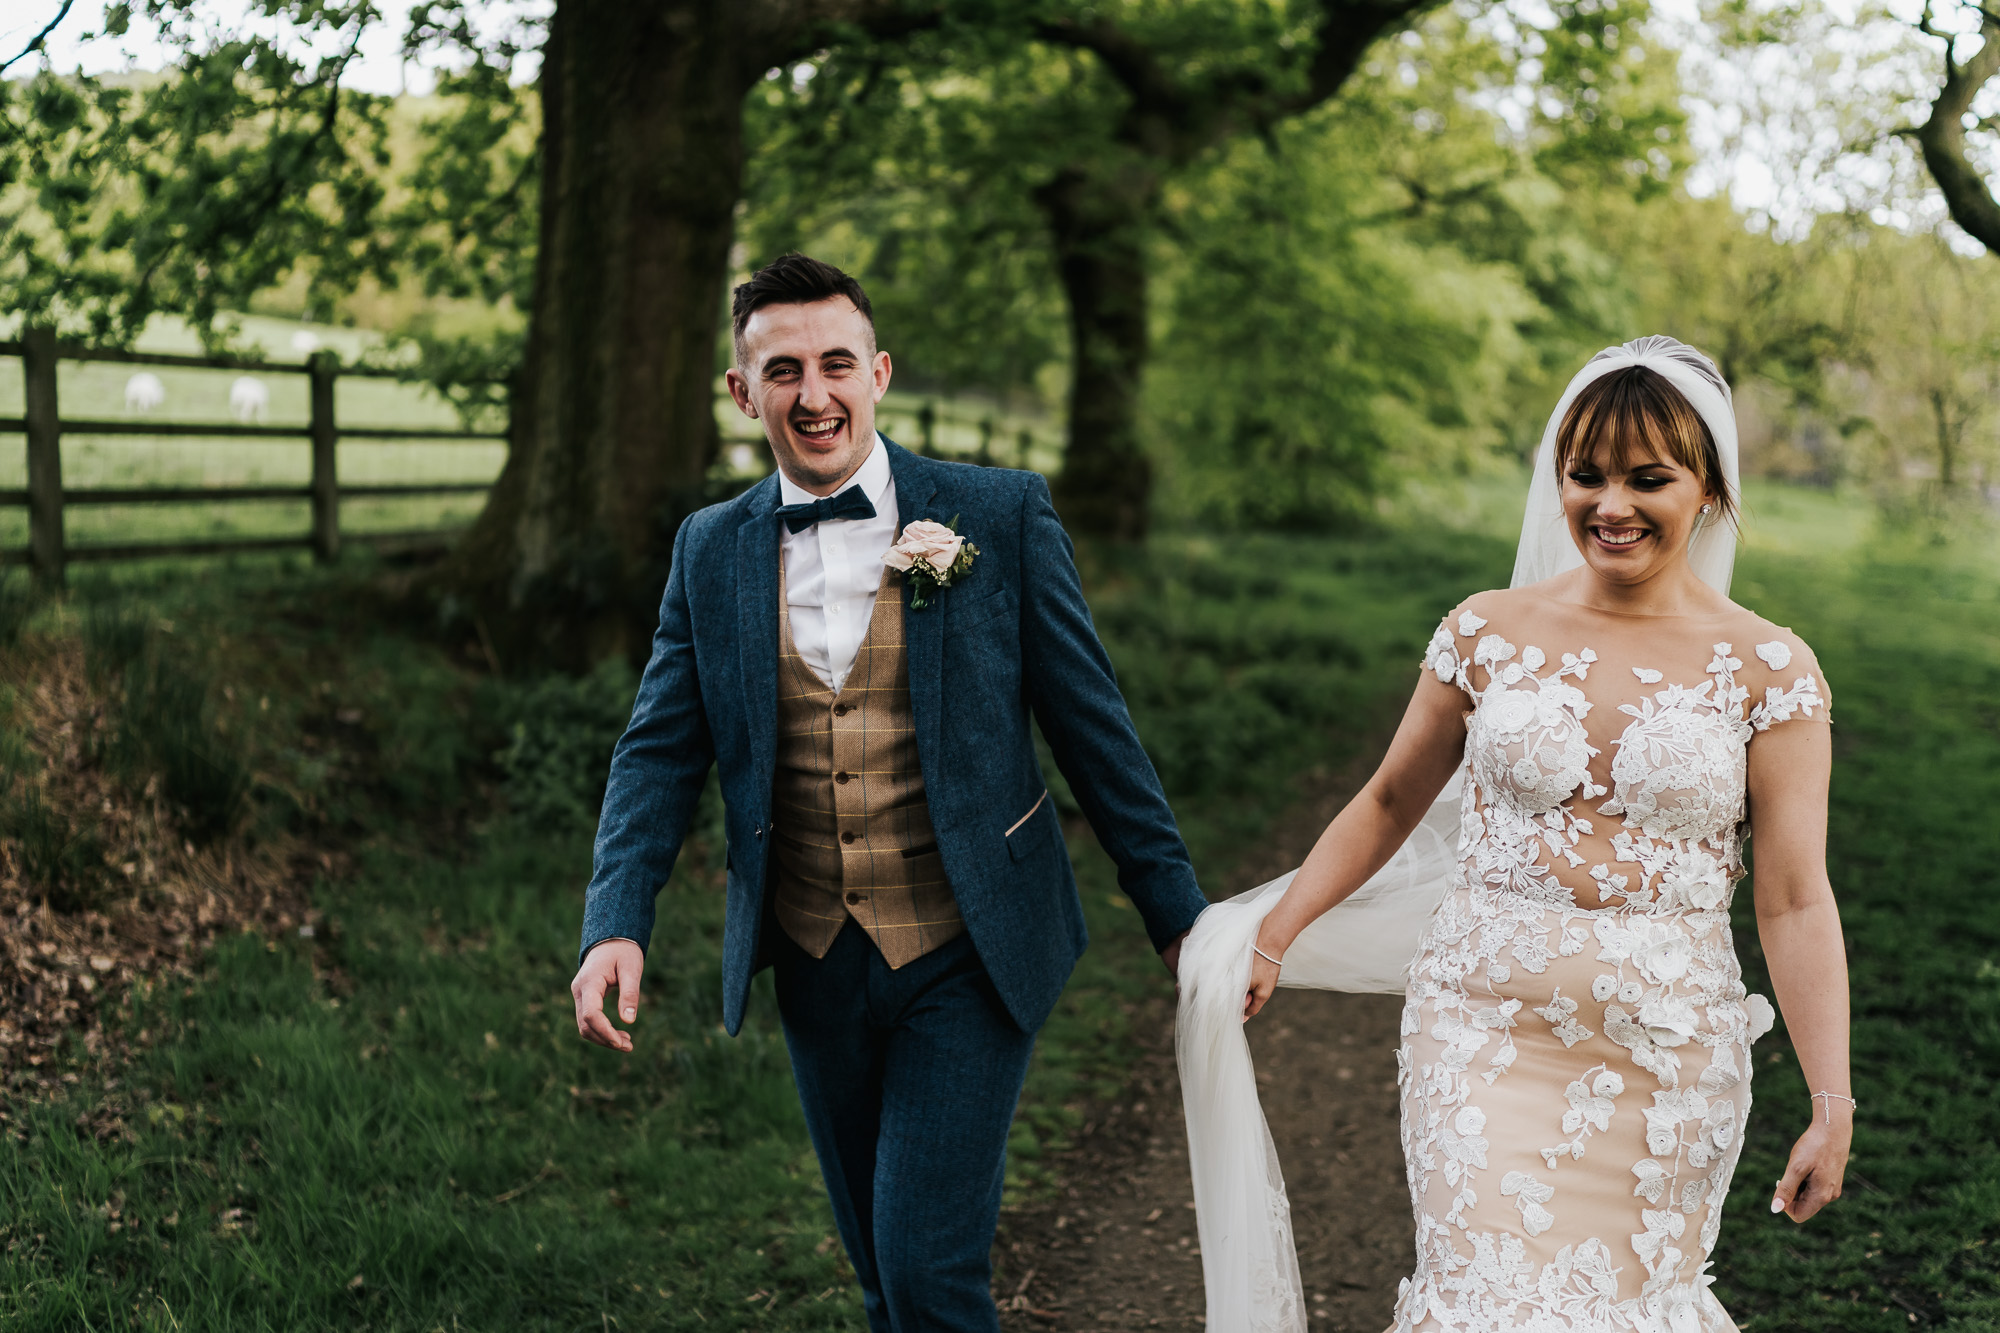 Rivington Hall Barn Wedding PHotographer lancashire wedding photography (31 of 34).jpg